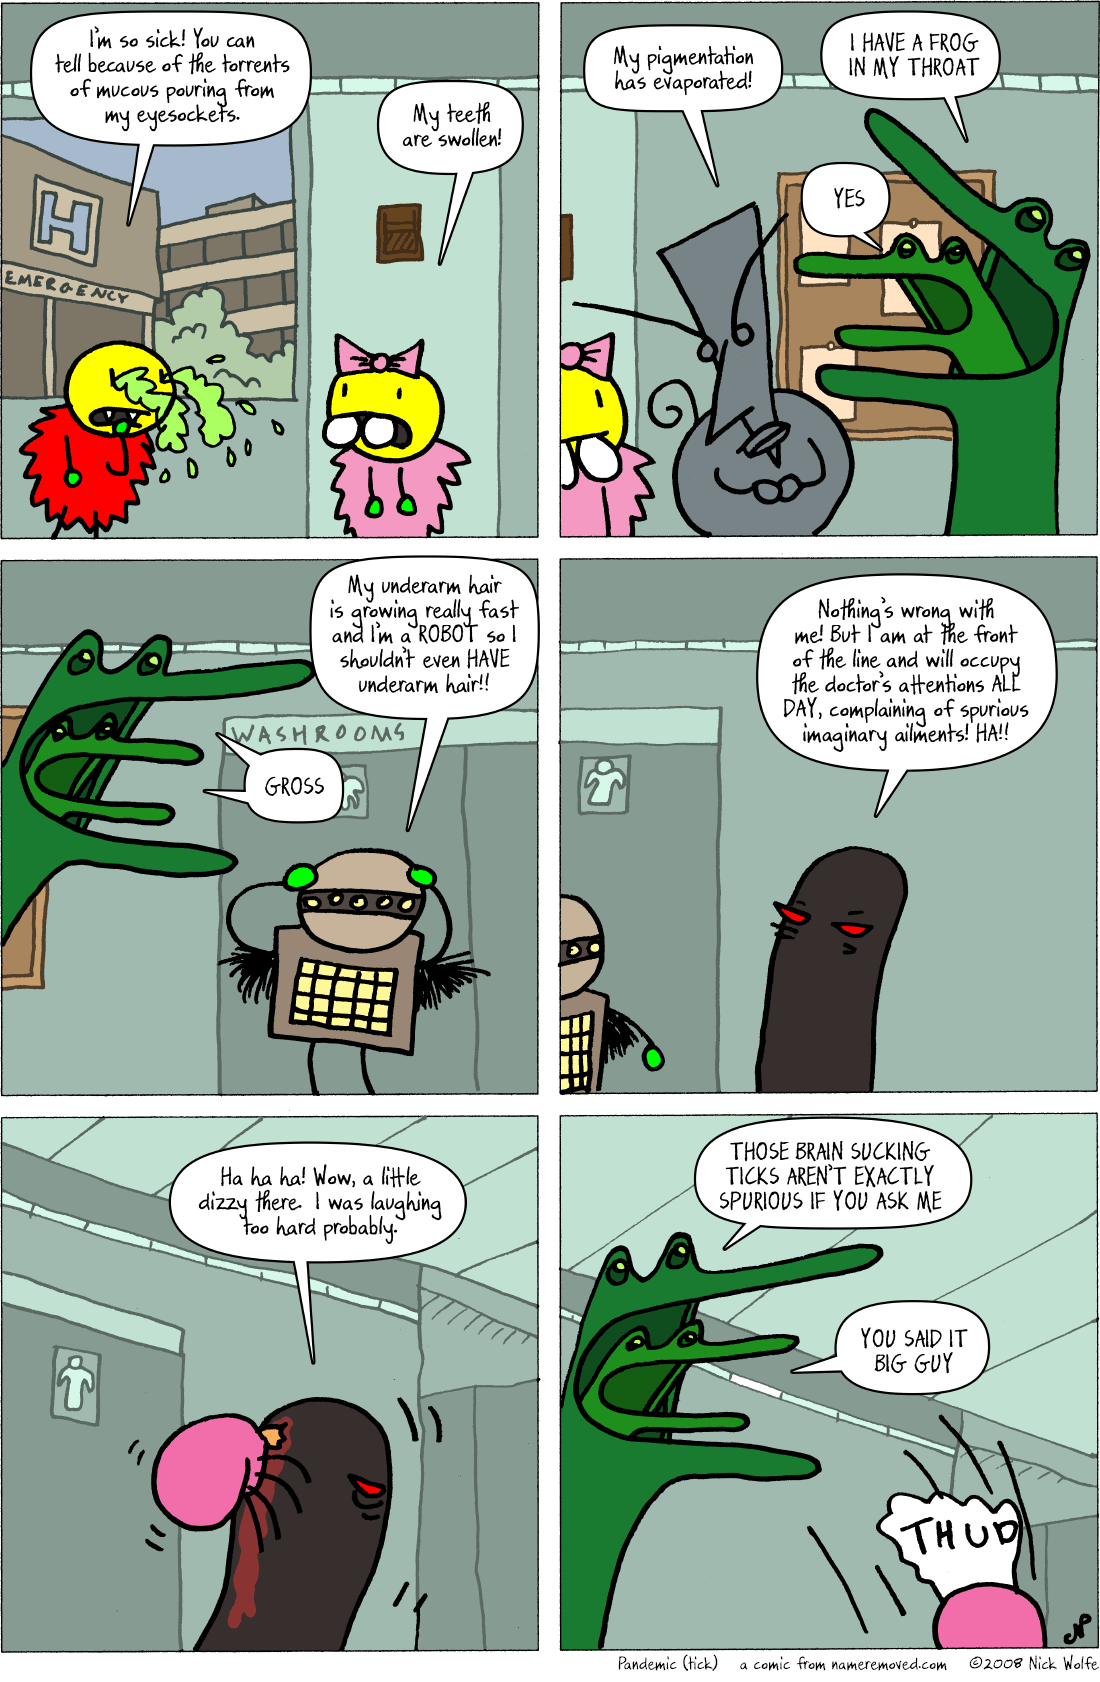 Pandemic (tick)